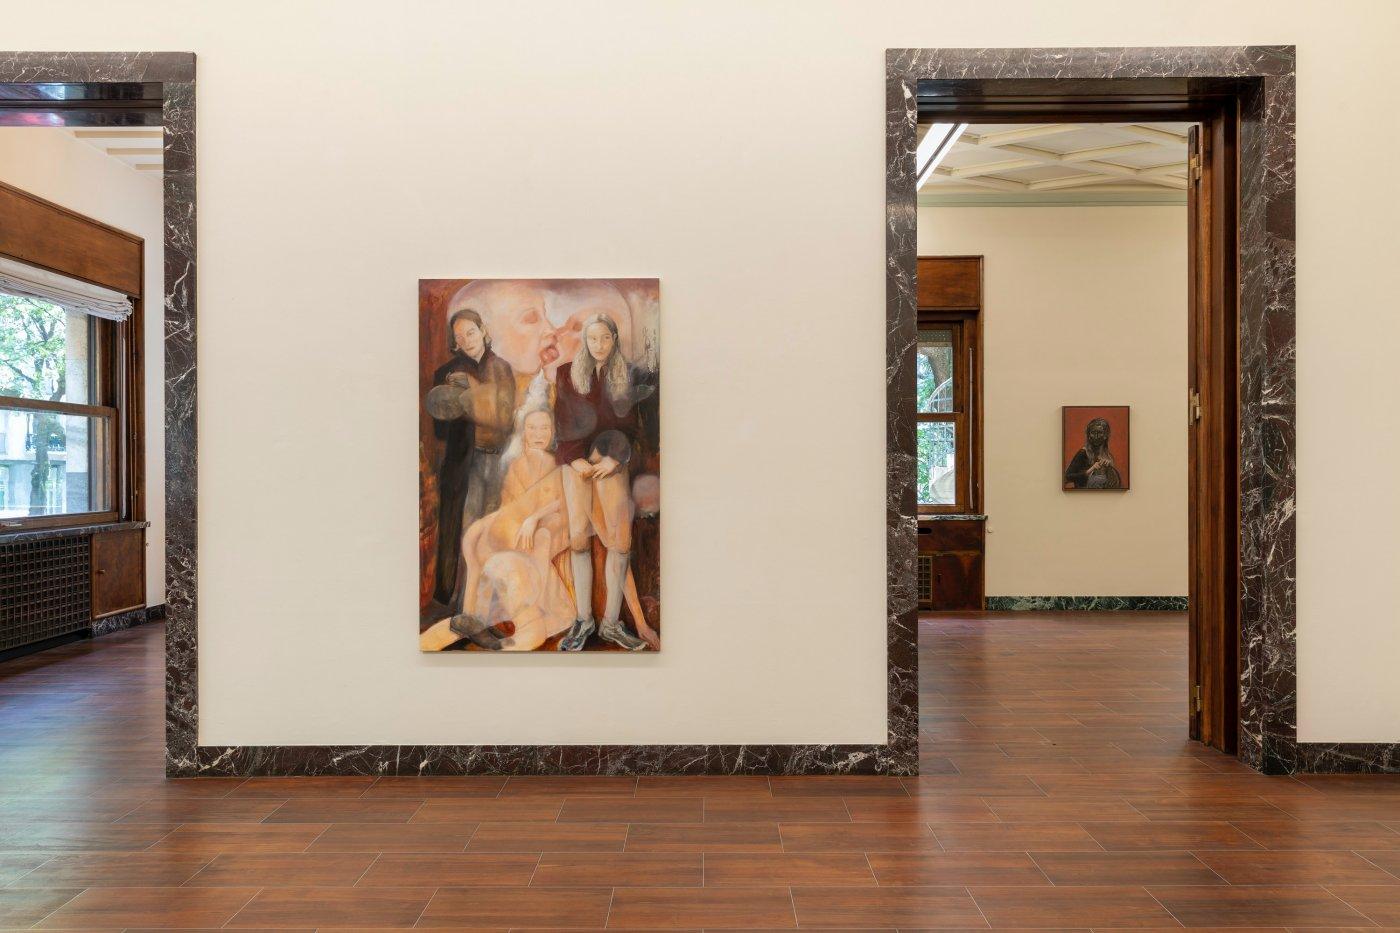 Massimo de Carlo Milan Portraiture One Century Apart 6